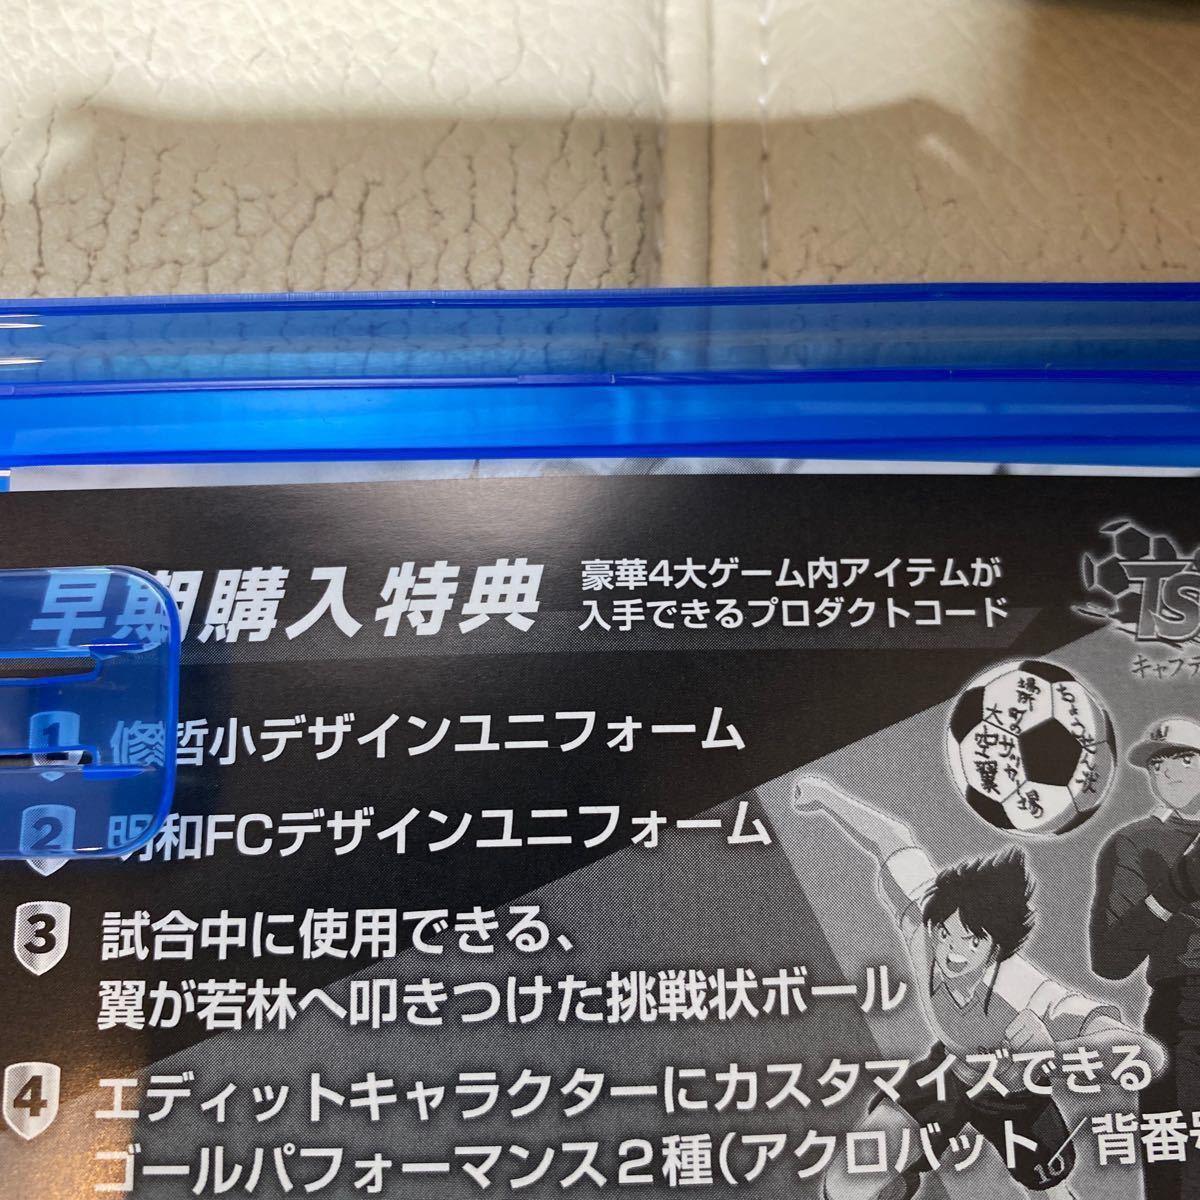 【PS4】 キャプテン翼 RISE OF NEW CHAMPIONS 早期購入特典付 期限あり